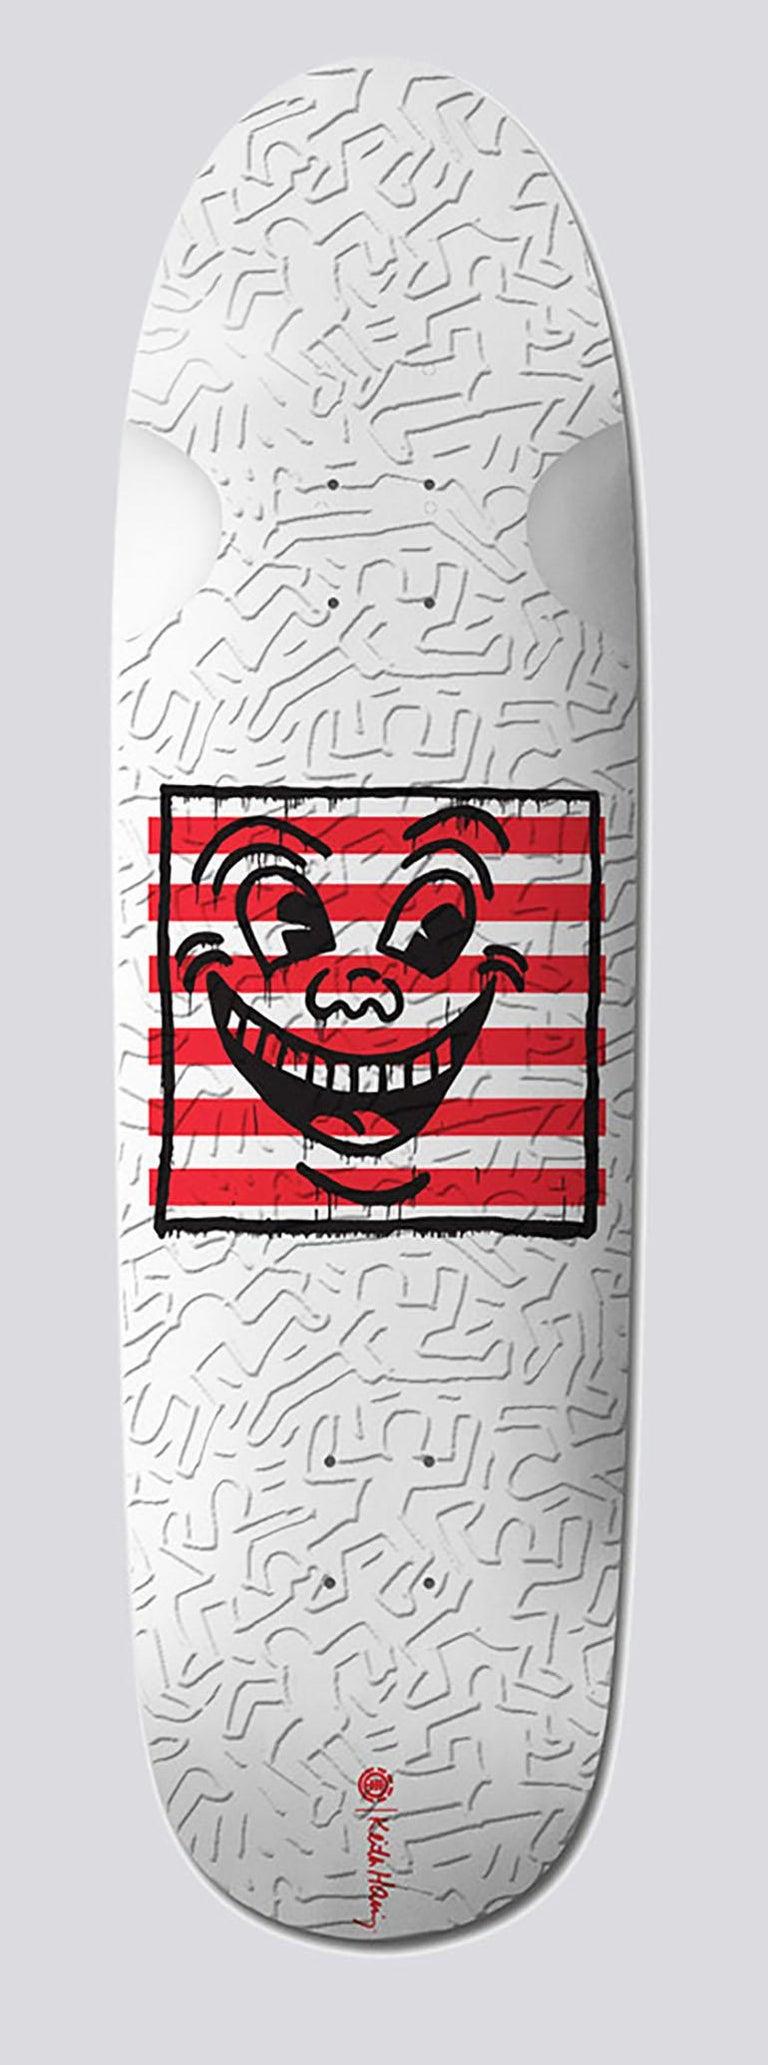 Keith Haring Skateboard Decks: set of 2 (Keith Haring smiley face) - Street Art Mixed Media Art by (after) Keith Haring